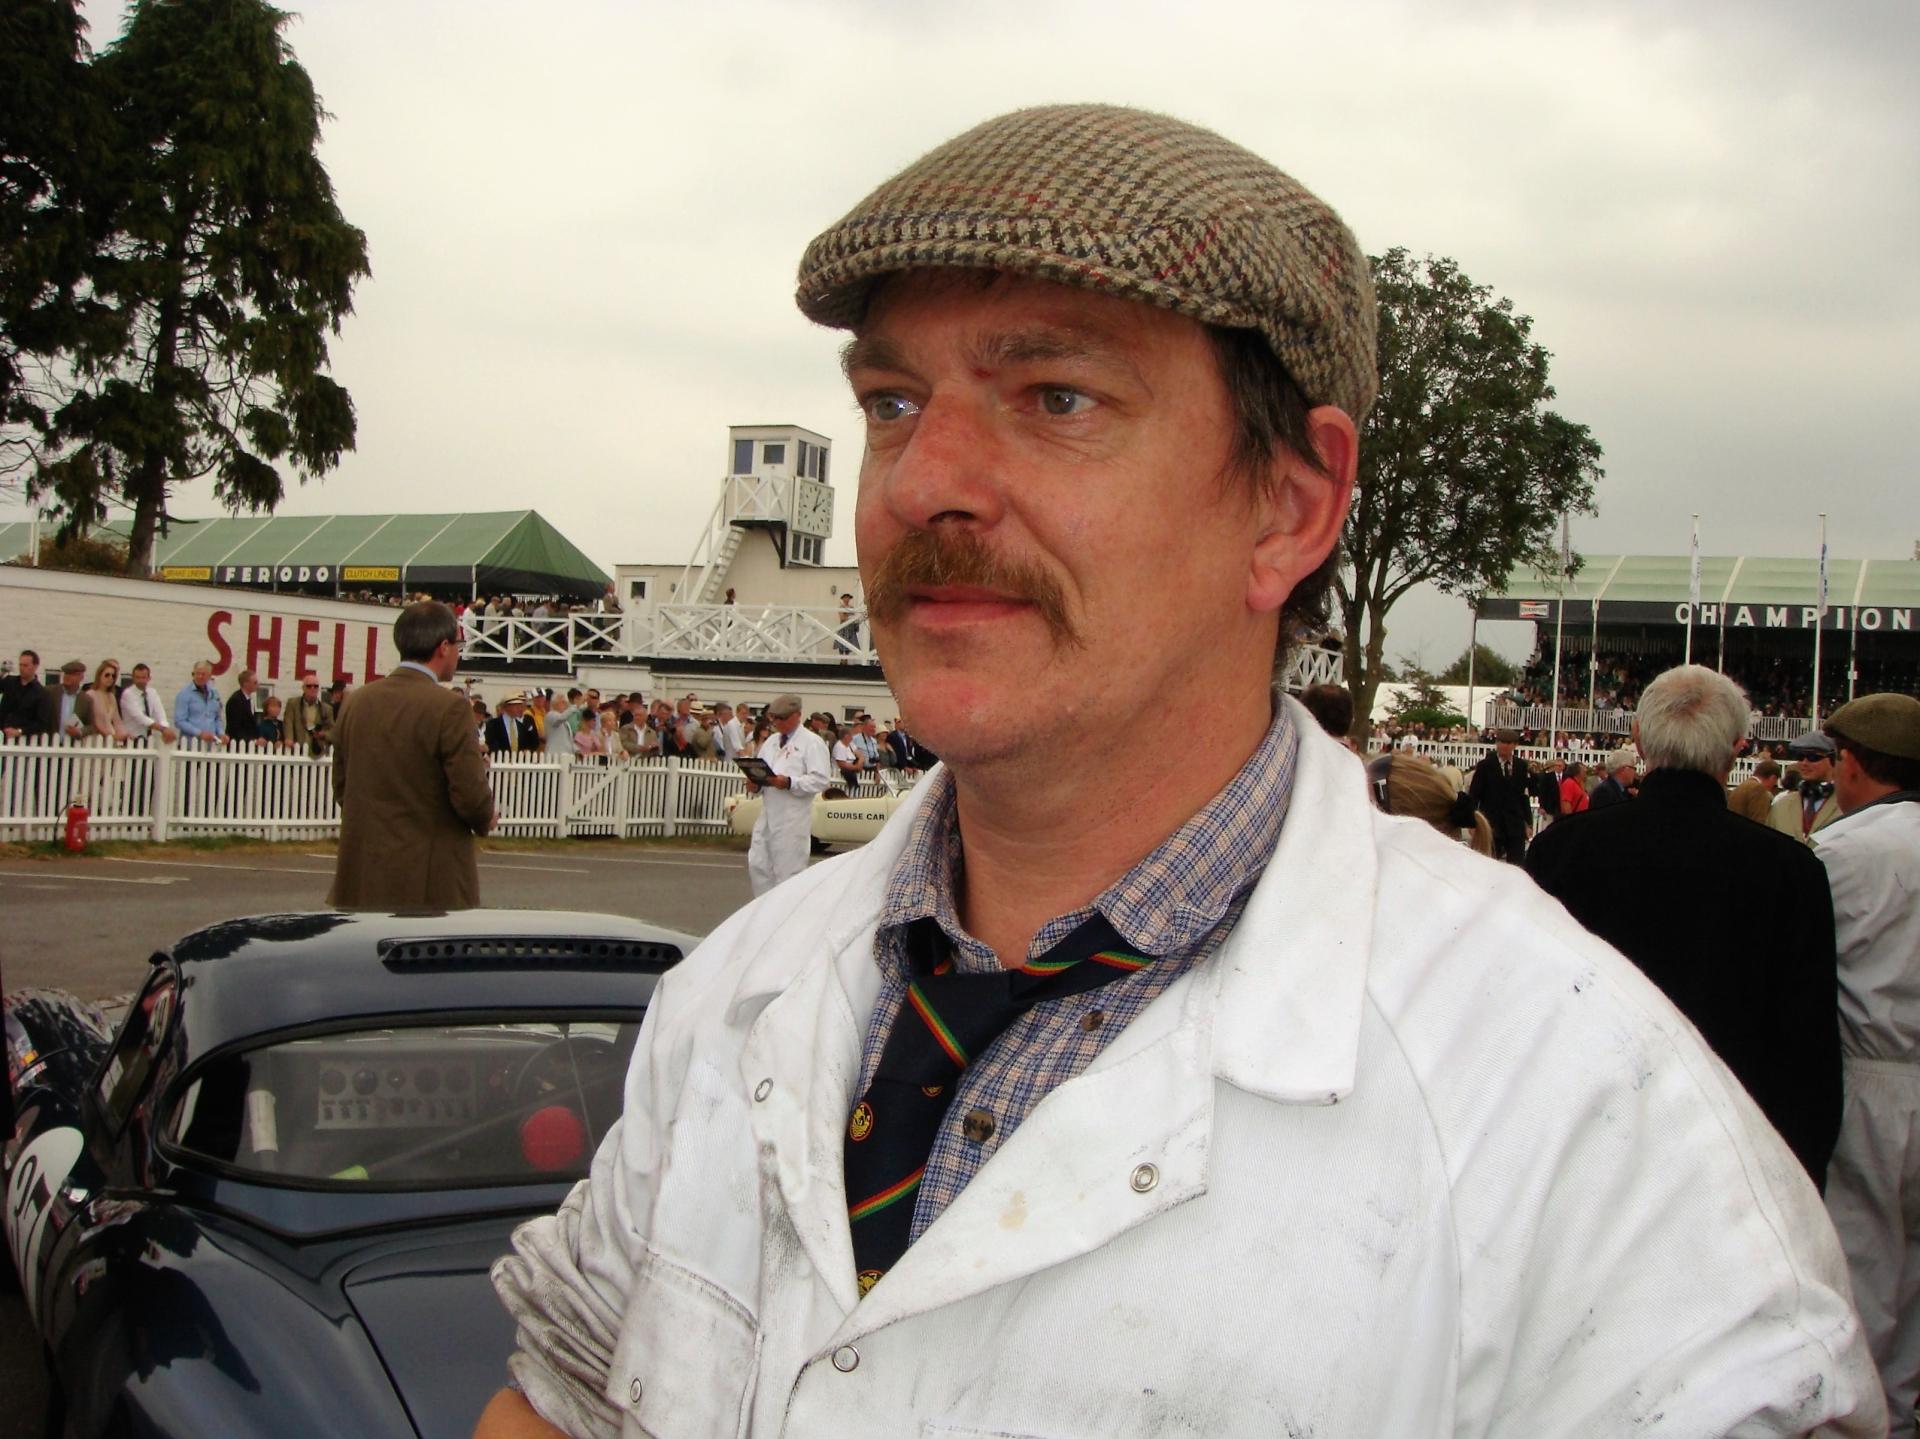 Dave Coussens